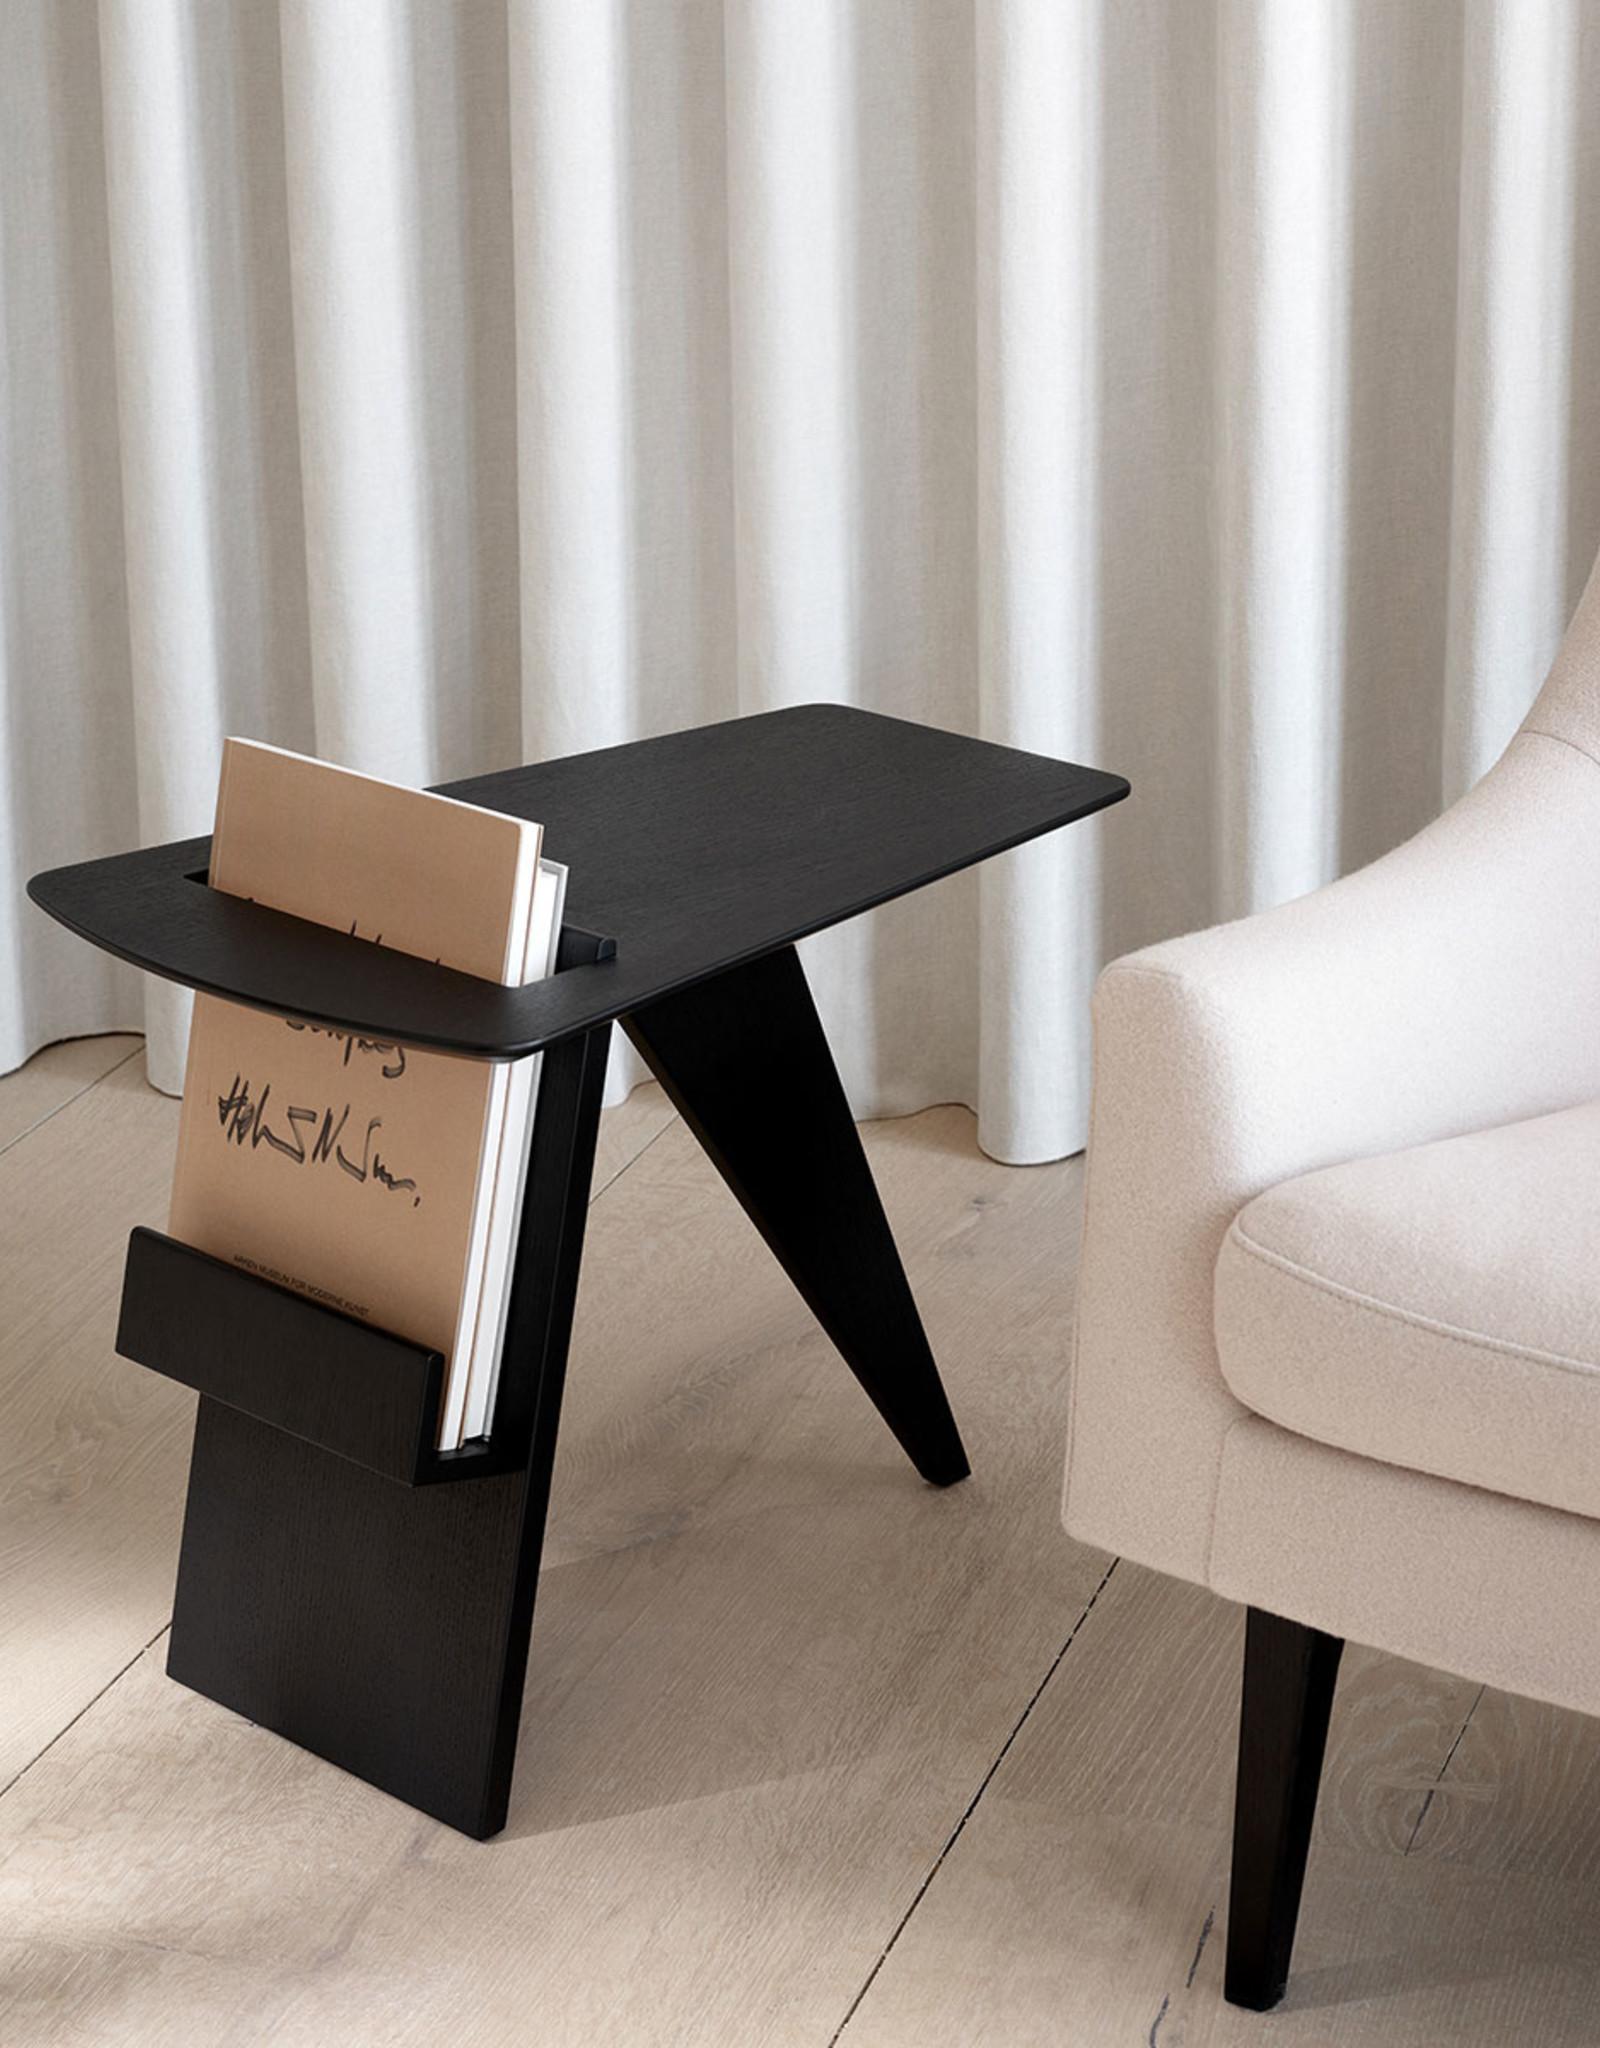 FREDERICIA Risom magazine table by Jens Risom |  Black lacquered oak